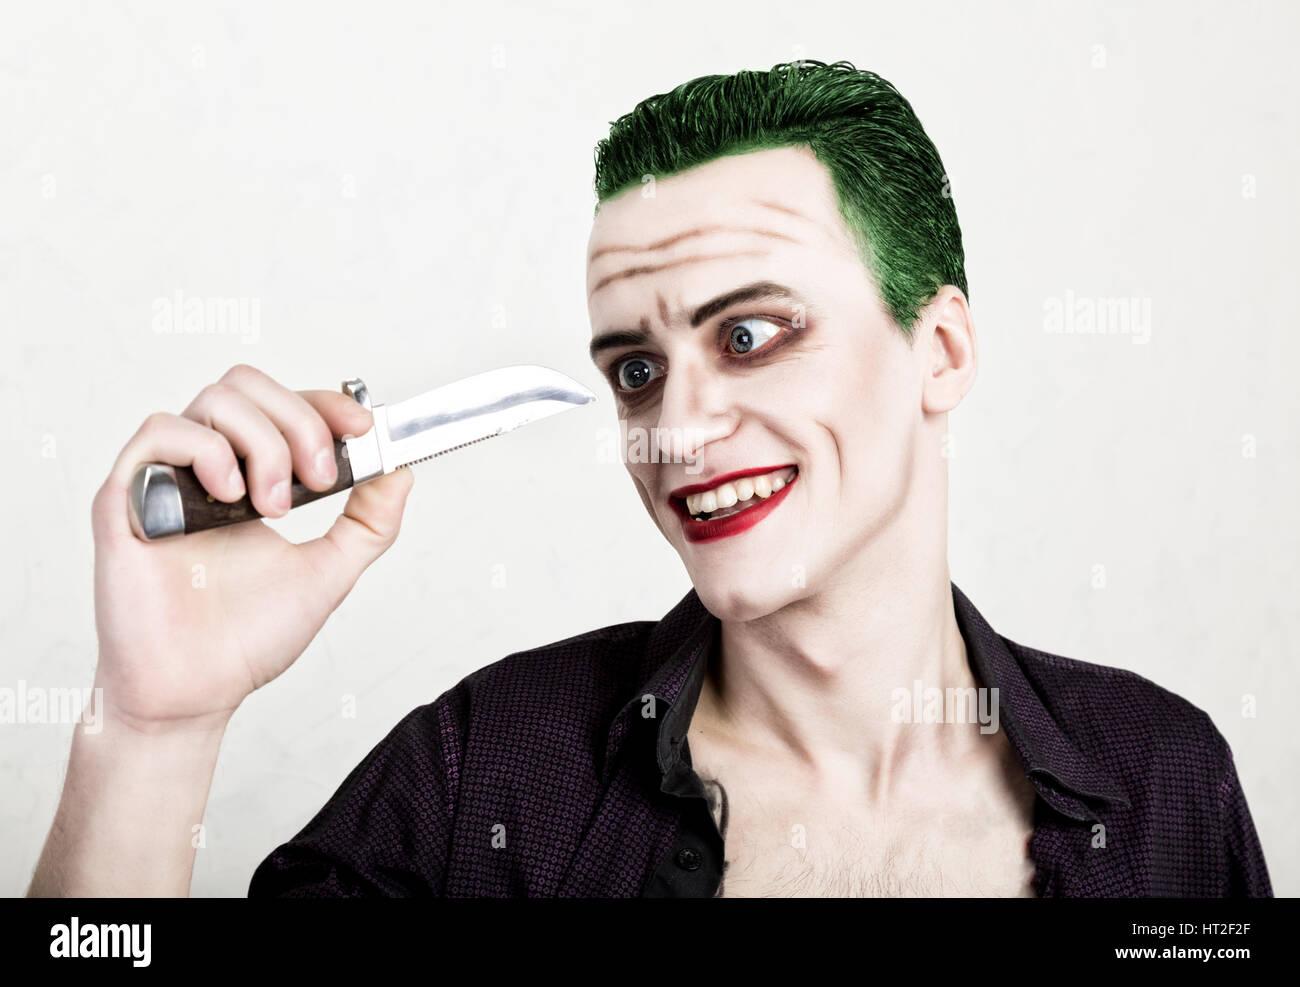 Spiksplinternieuw guy with crazy joker face holding knife, green hair and idiotic AF-24